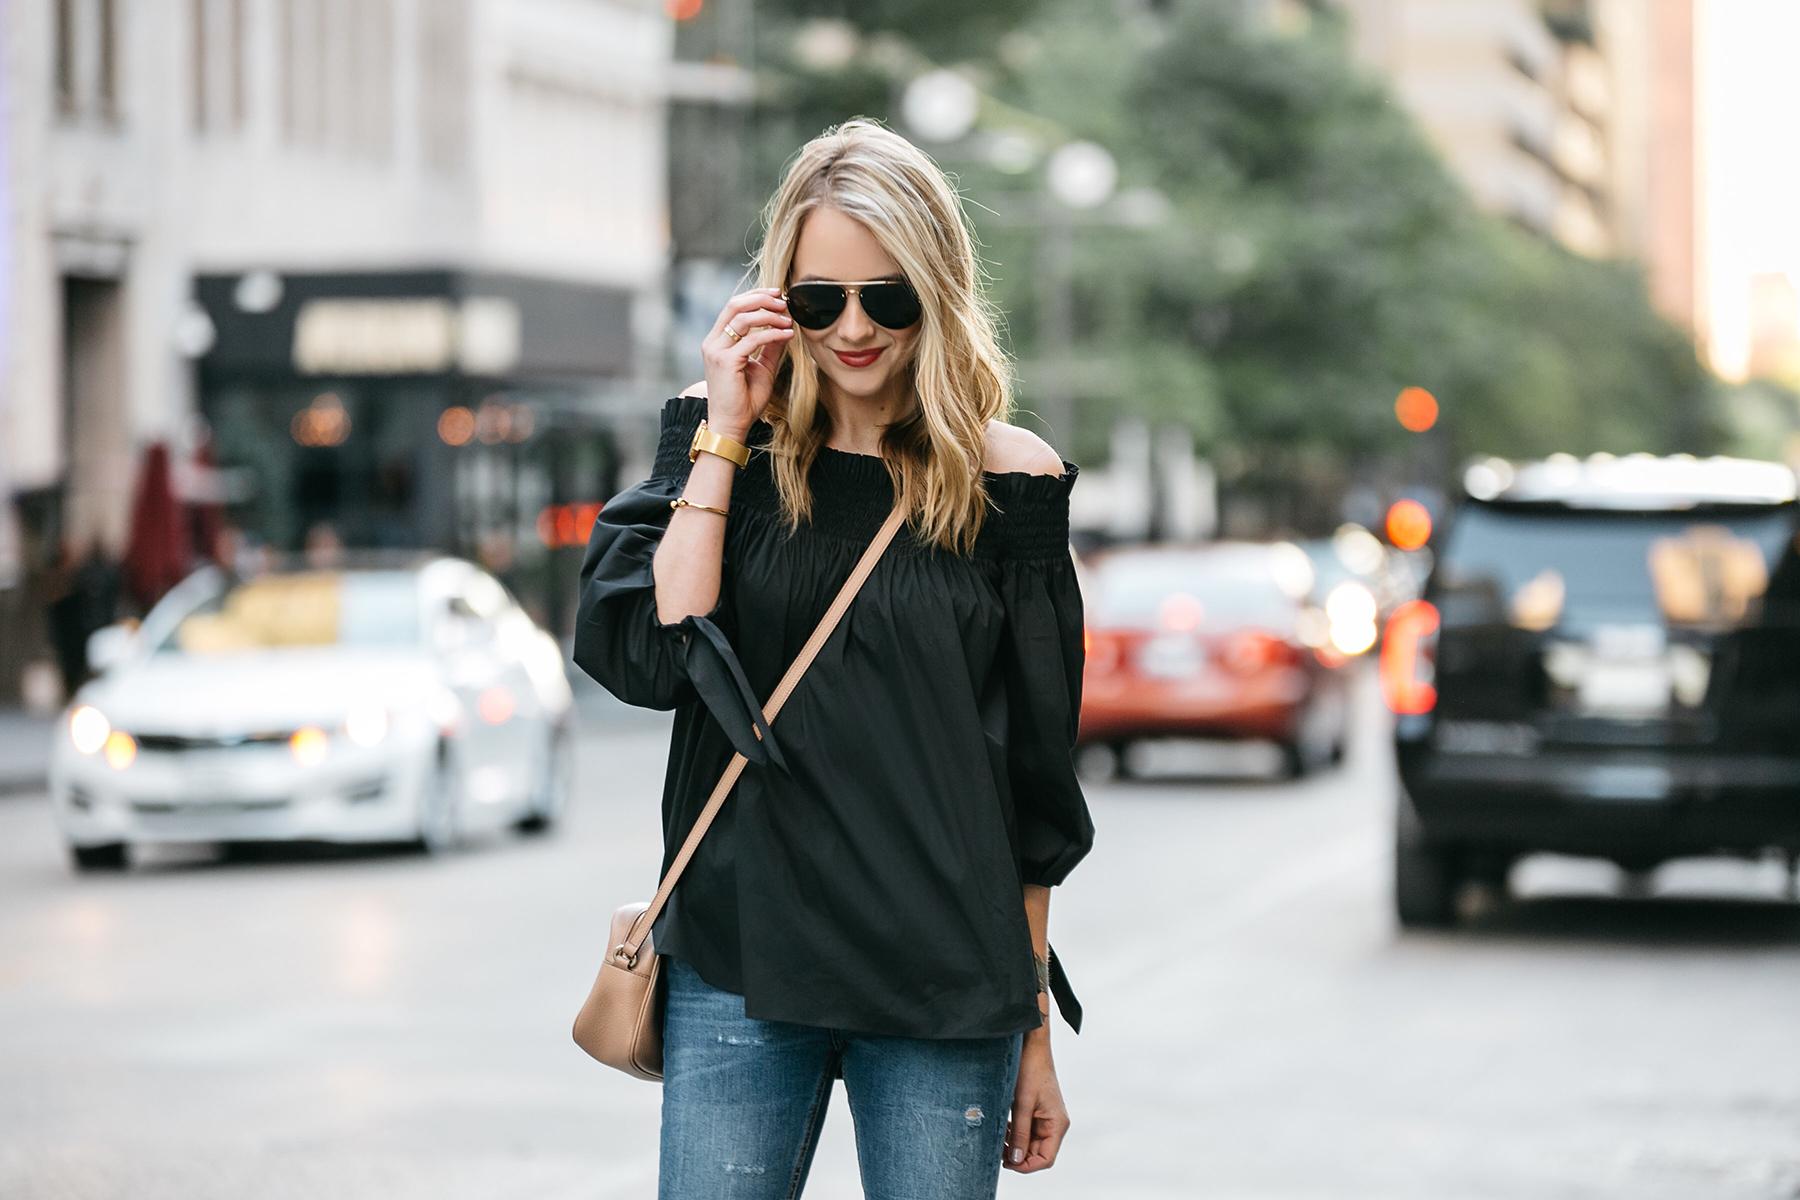 Fashion Jackson, Dallas Blogger, Fashion Blogger, Street Style, Caroline Constas Lou Off the Shoulder Top Black, Denim Ripped Skinny Jeans, Gucci Soho Disco Crossbody, Celine Aviator Sunglasses